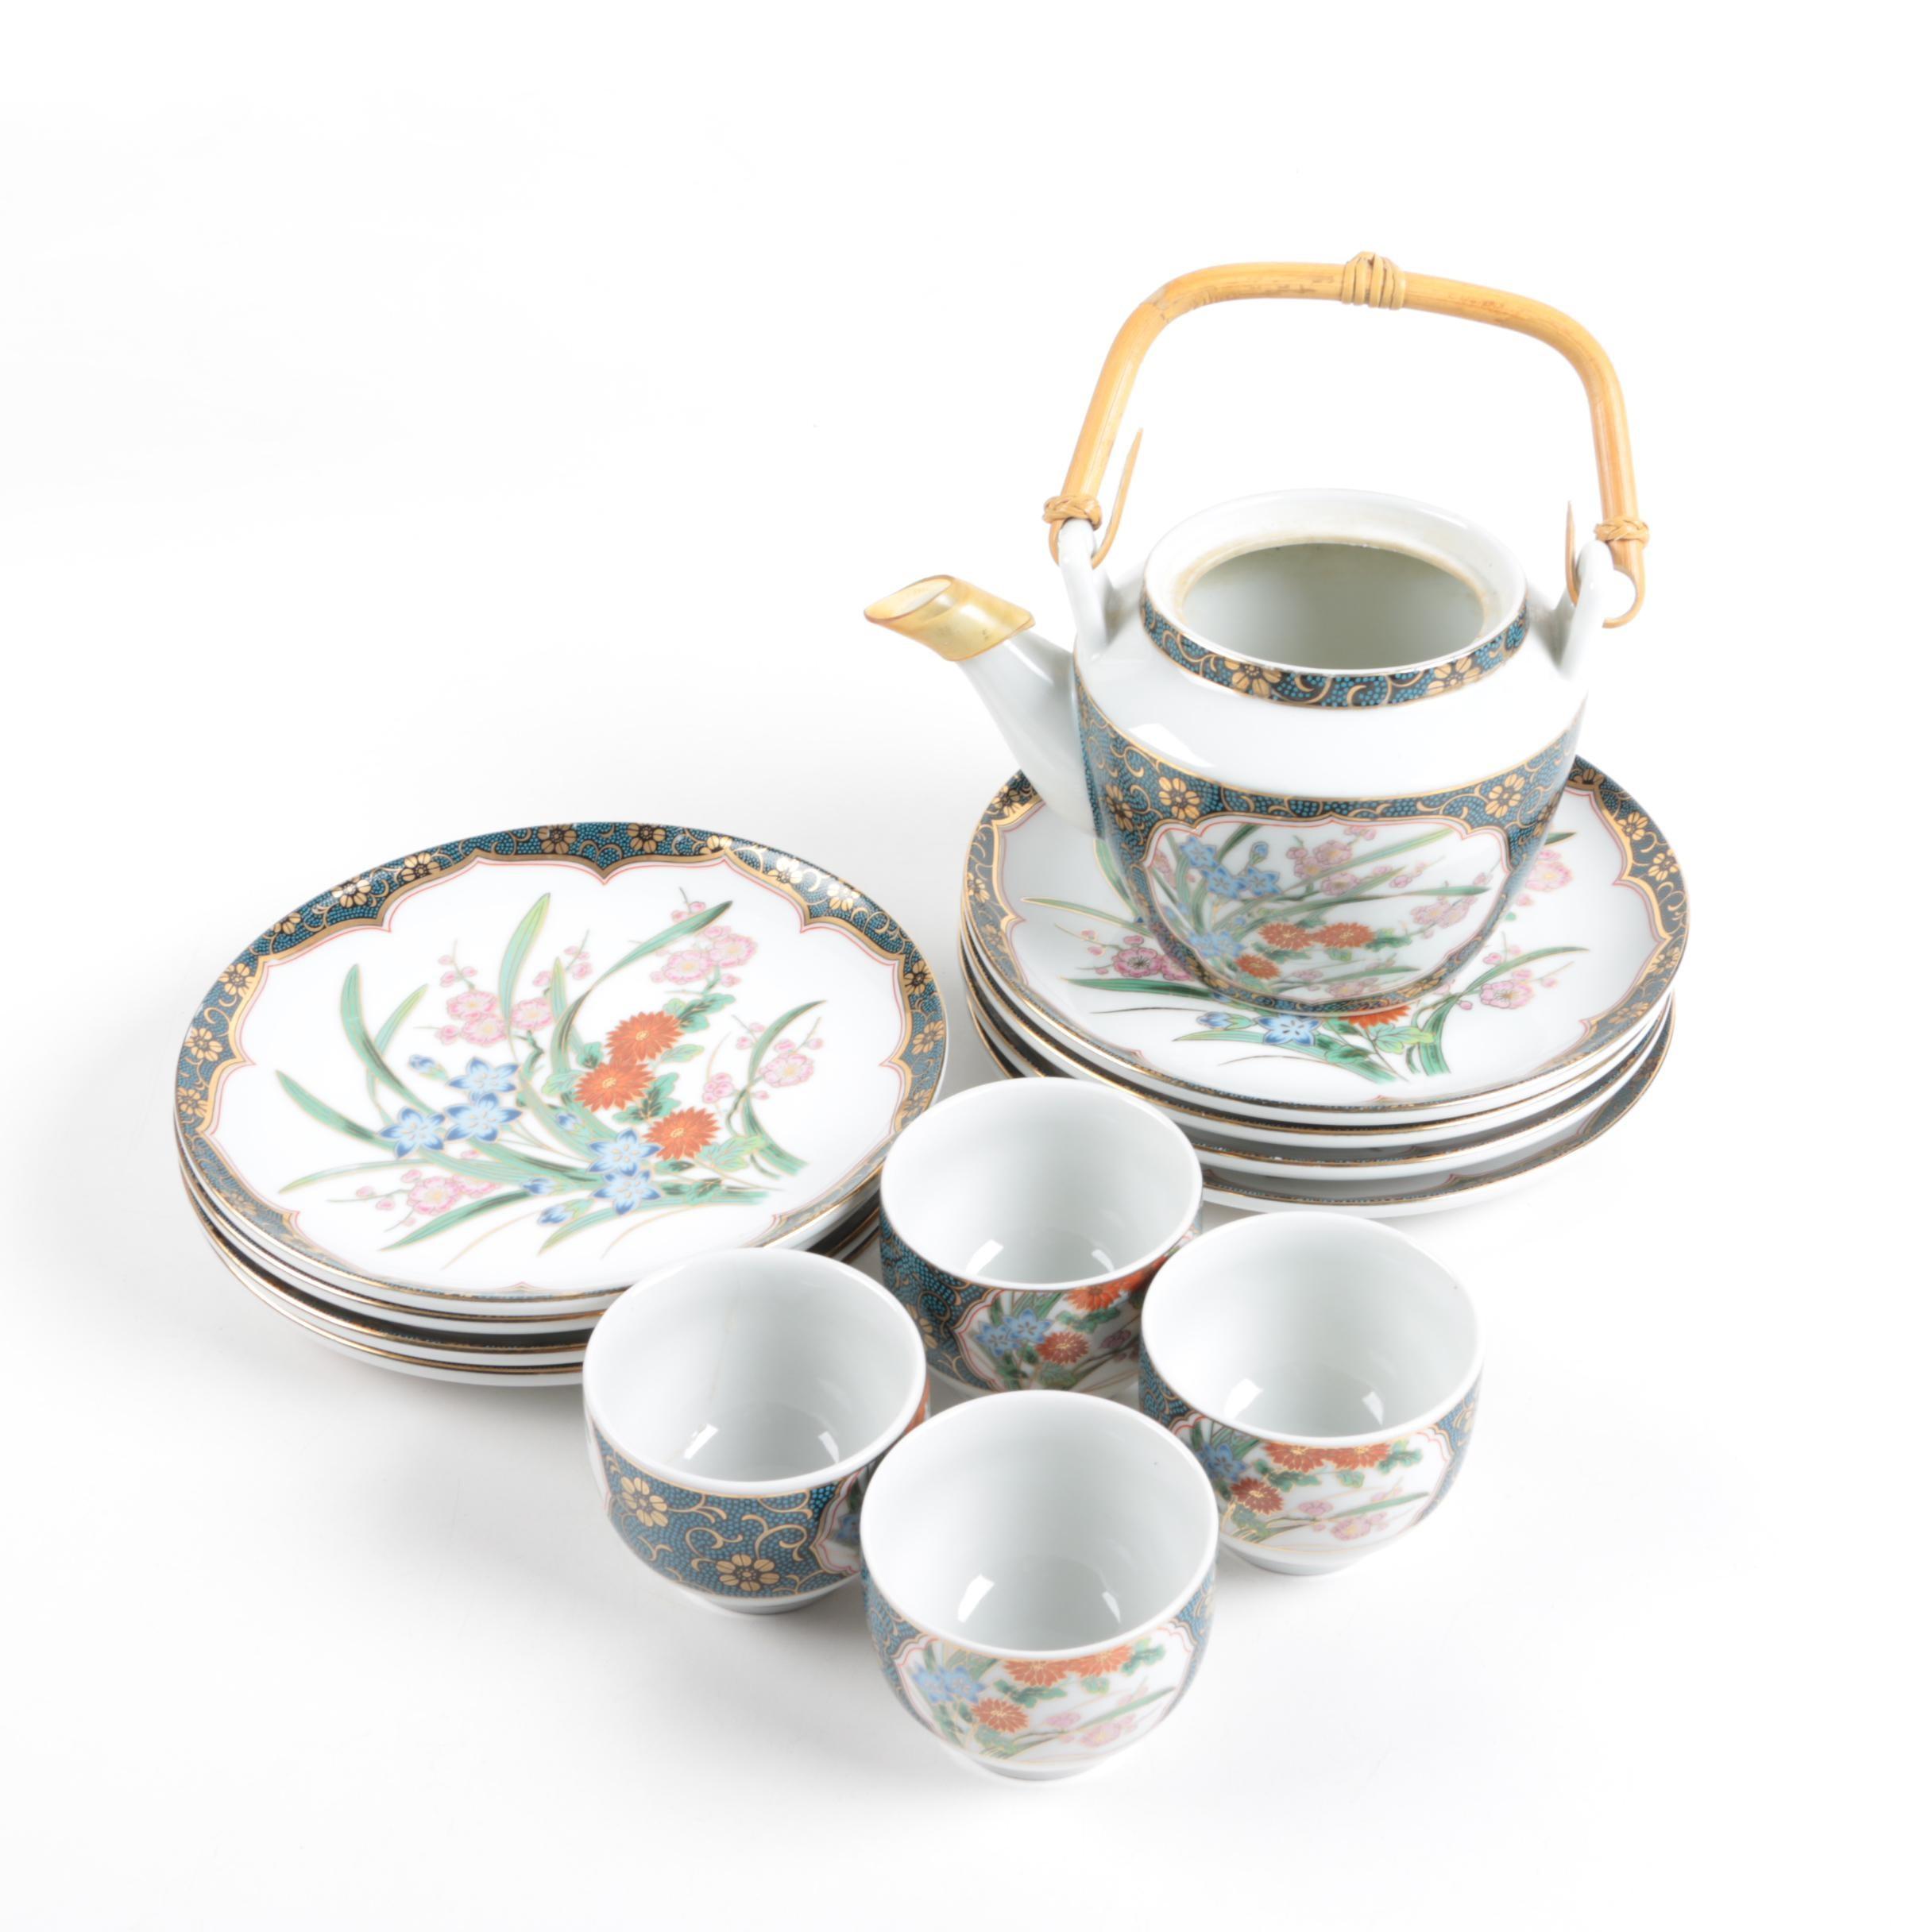 Otagiri Mercantile Company Tea Service